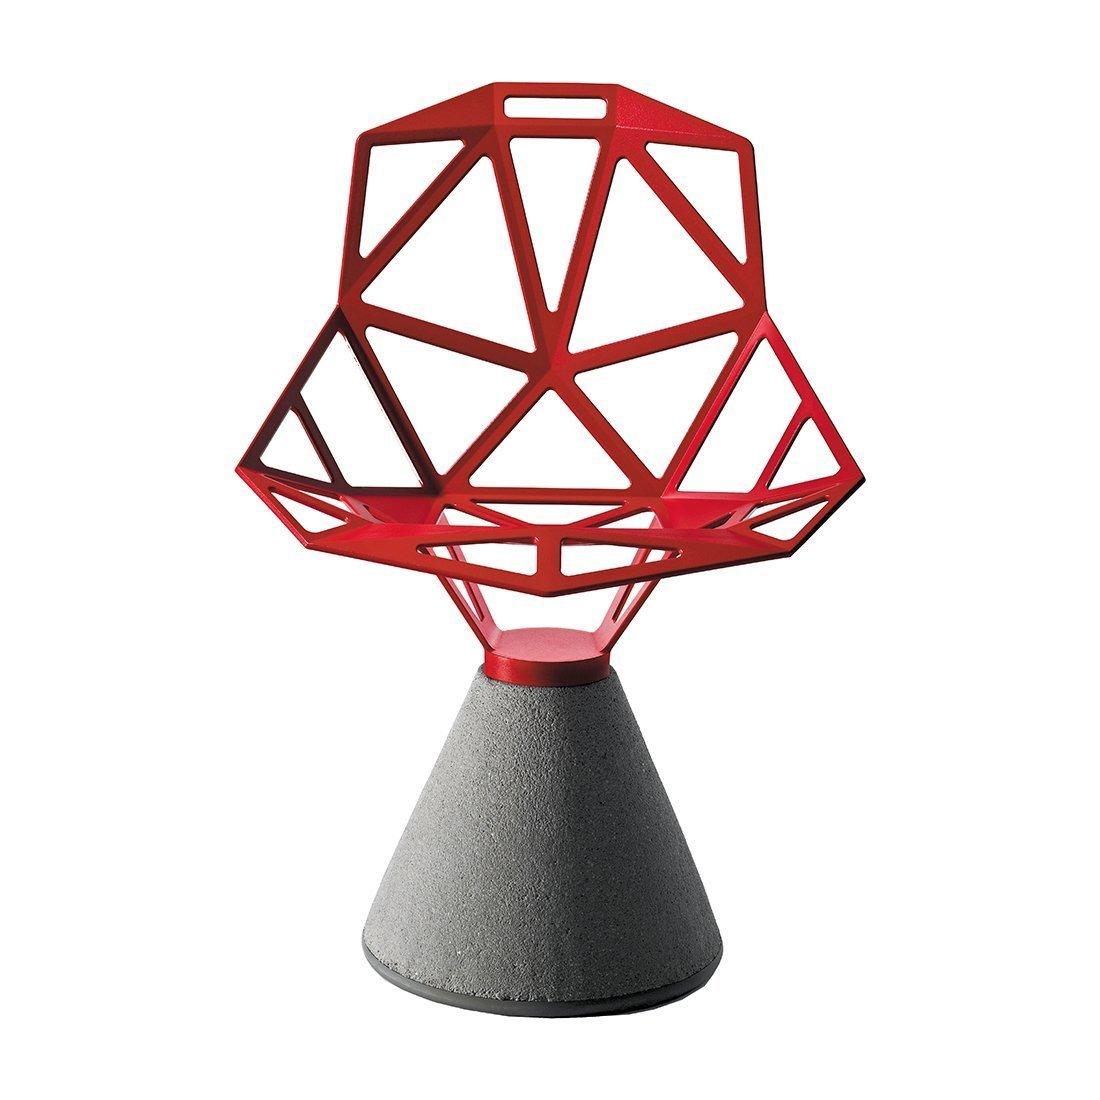 Magis Chair One Concrete Stoel Magis kopen